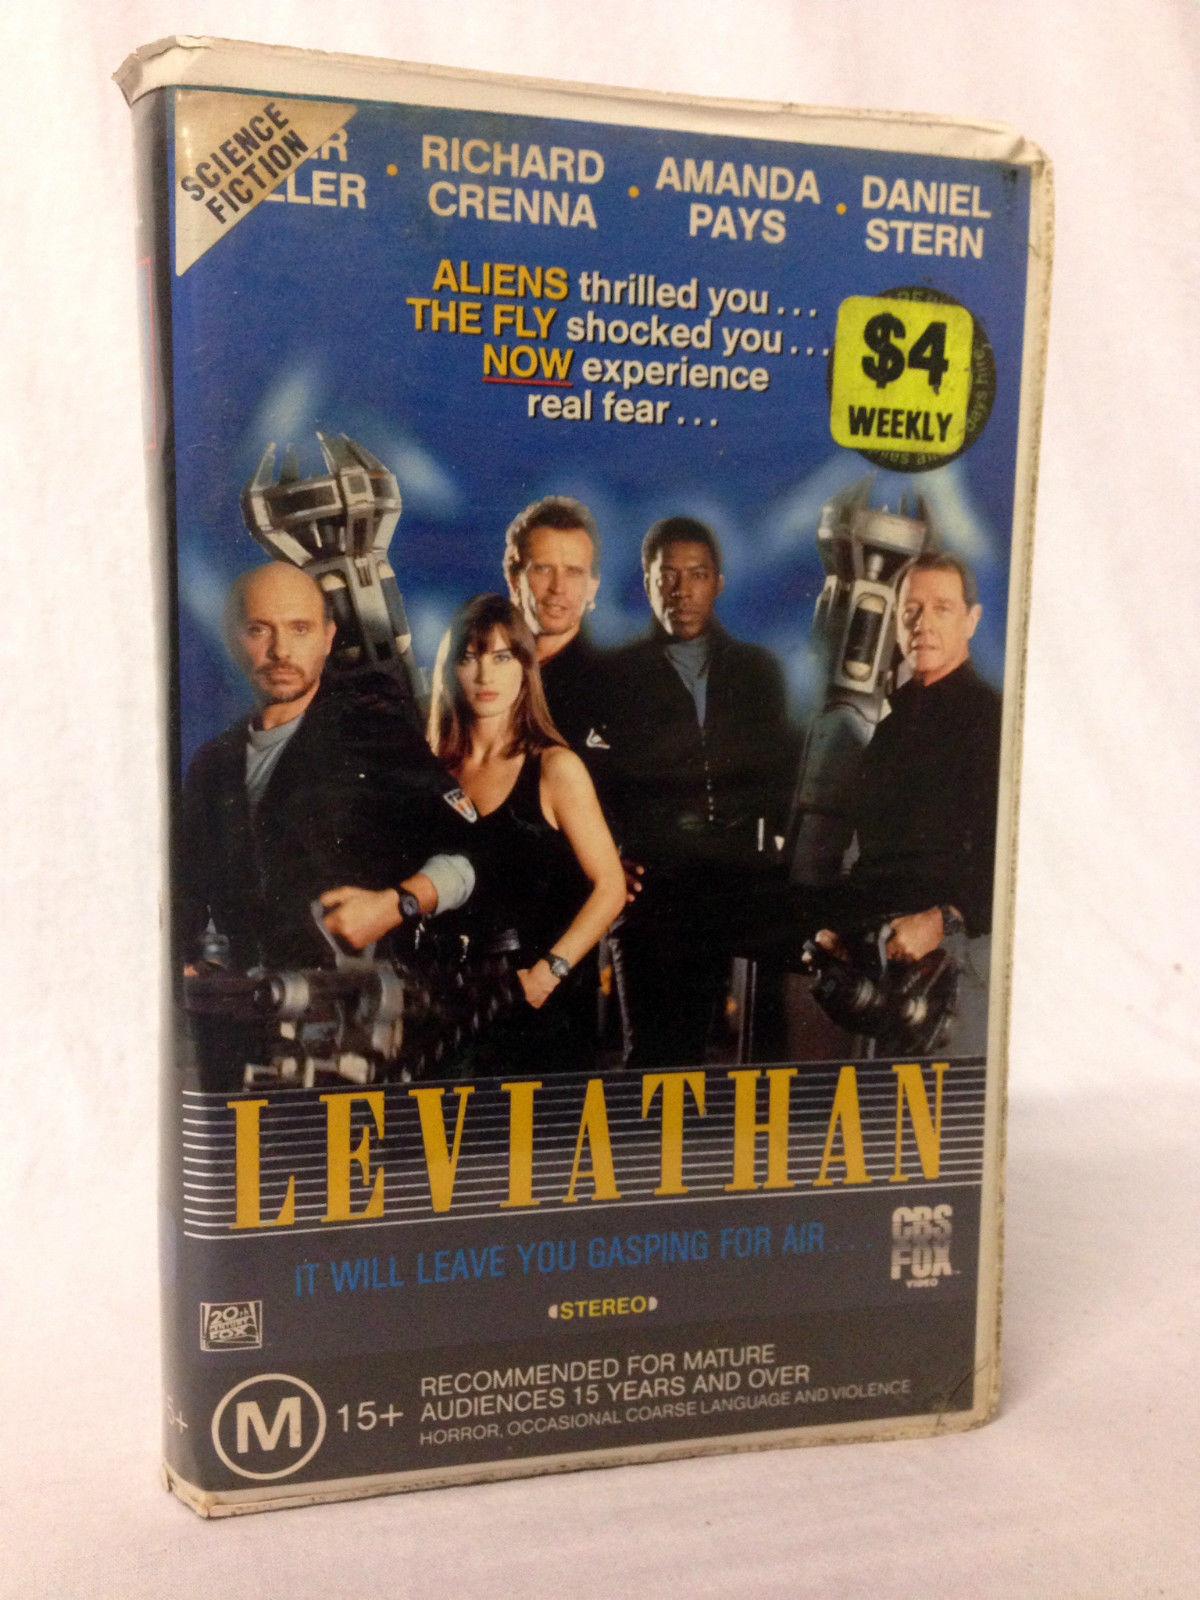 Peter Weller, Richard Crenna, Hector Elizondo, Ernie Hudson, and Amanda Pays in Leviathan (1989)